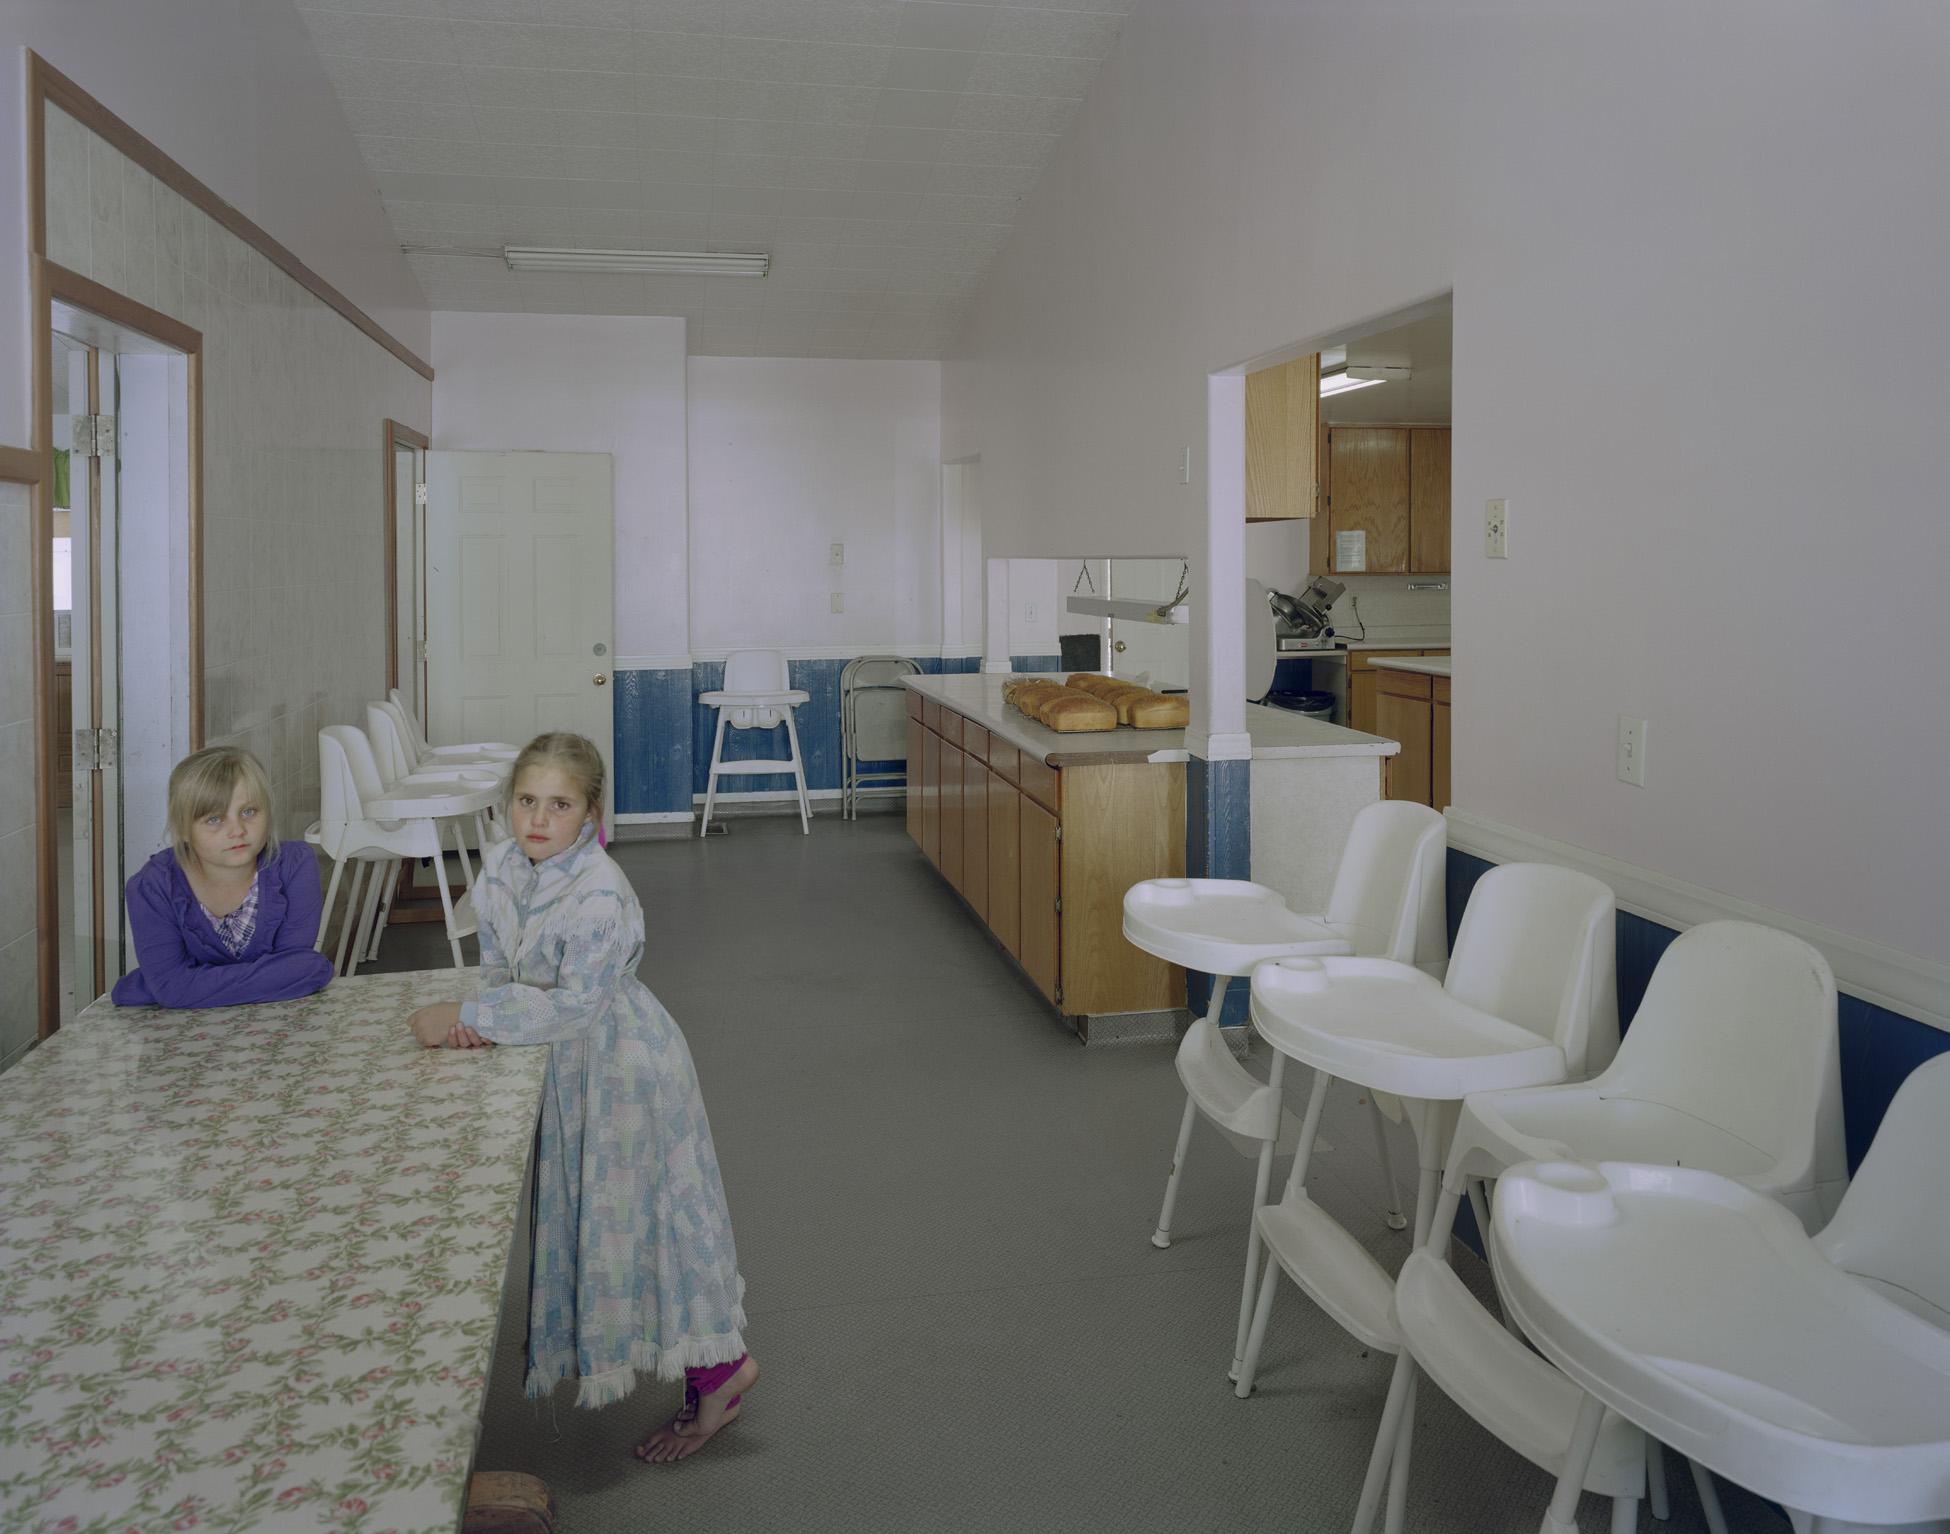 Winston Blackmore family compound